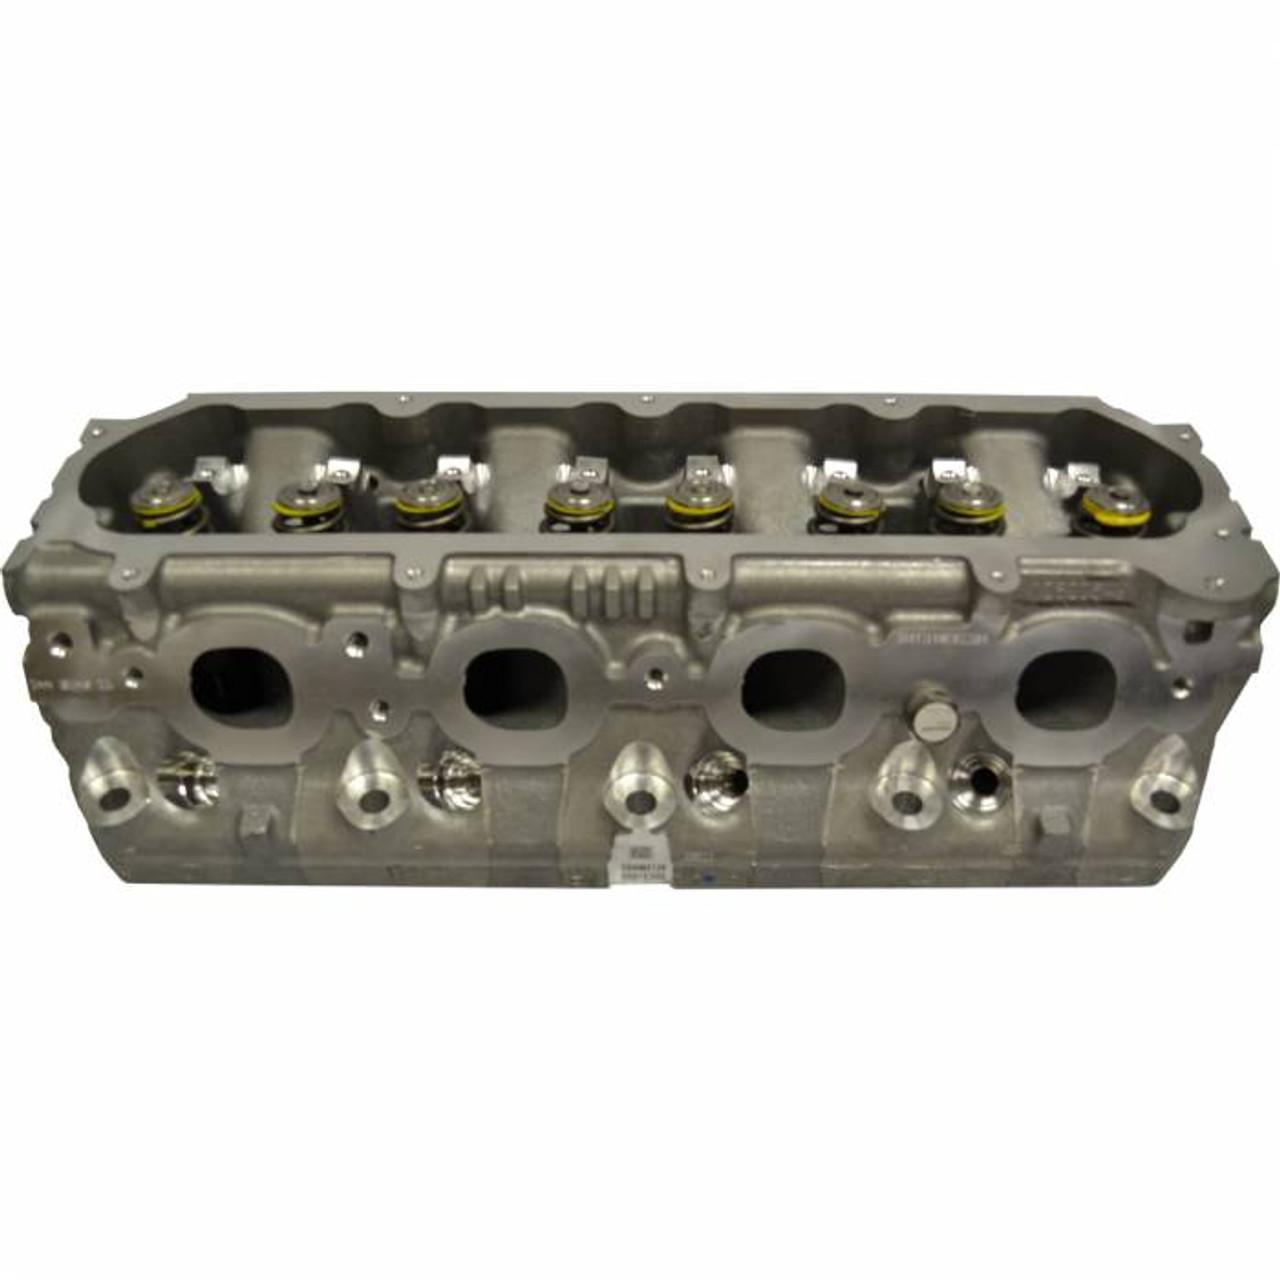 Chevrolet Performance Lt1 Cnc Aluminum Cylinder Head Assembly 19329839